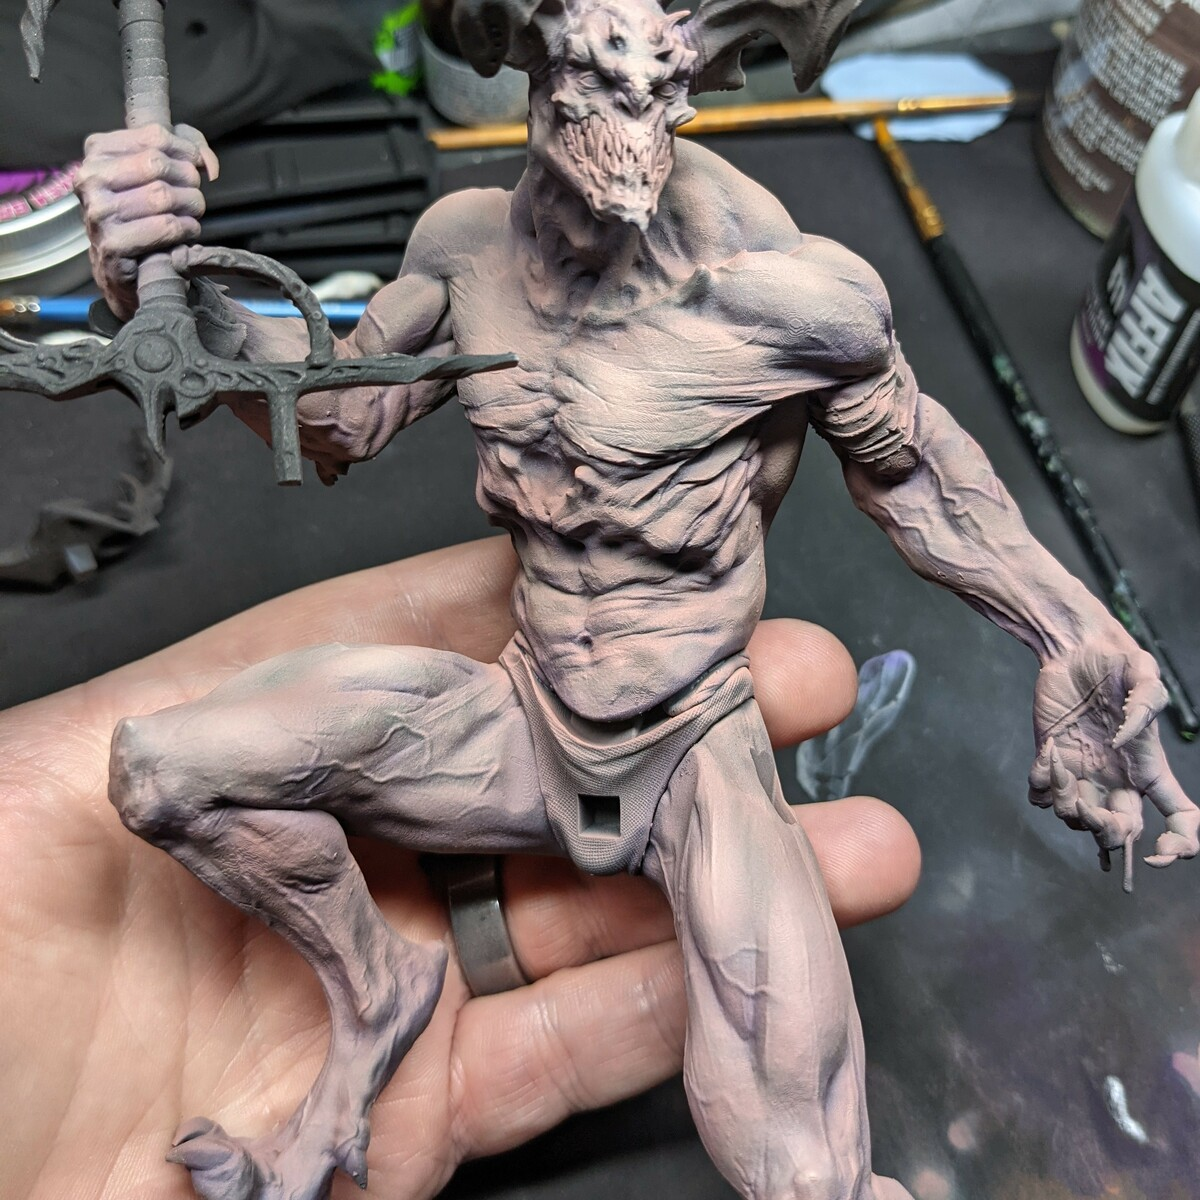 Demon (Human Flesh colored) Skin